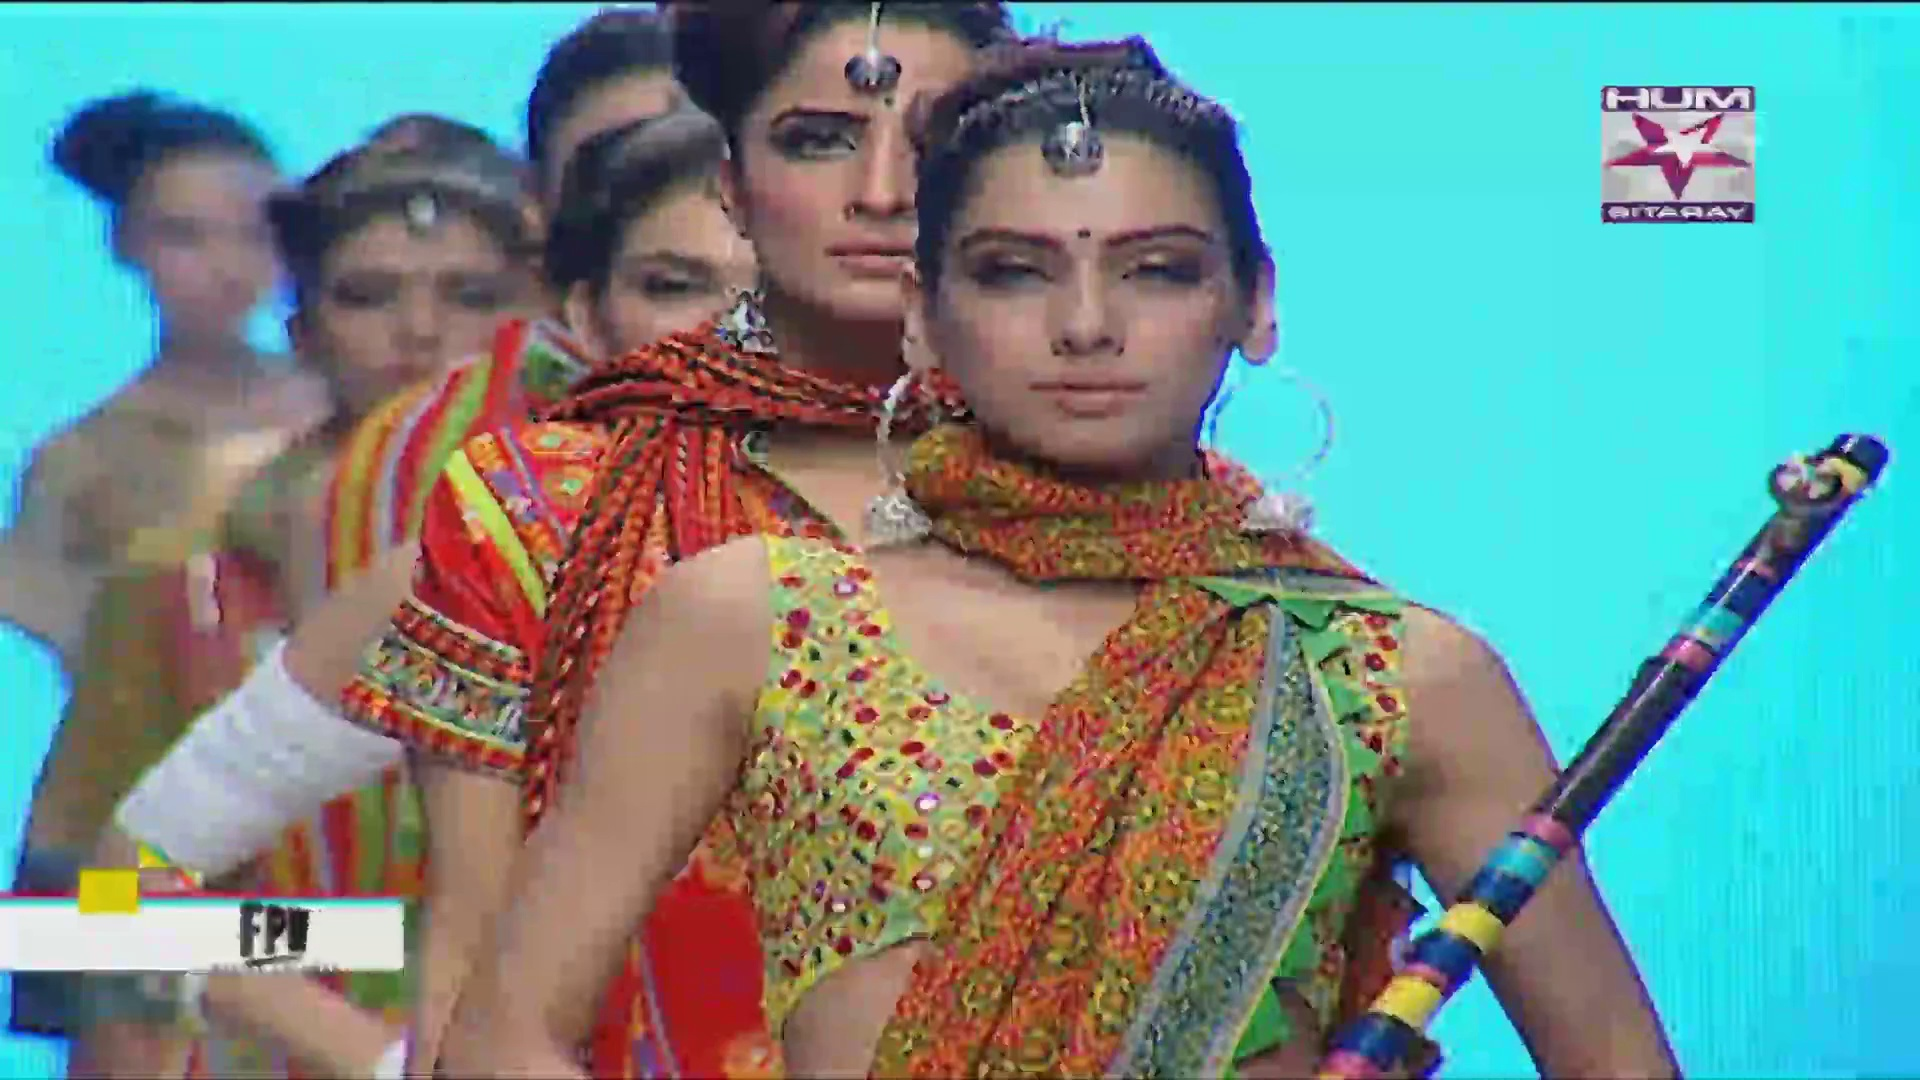 FPW   Hum Sitaray TV Dramas Online – Humsitaray TV